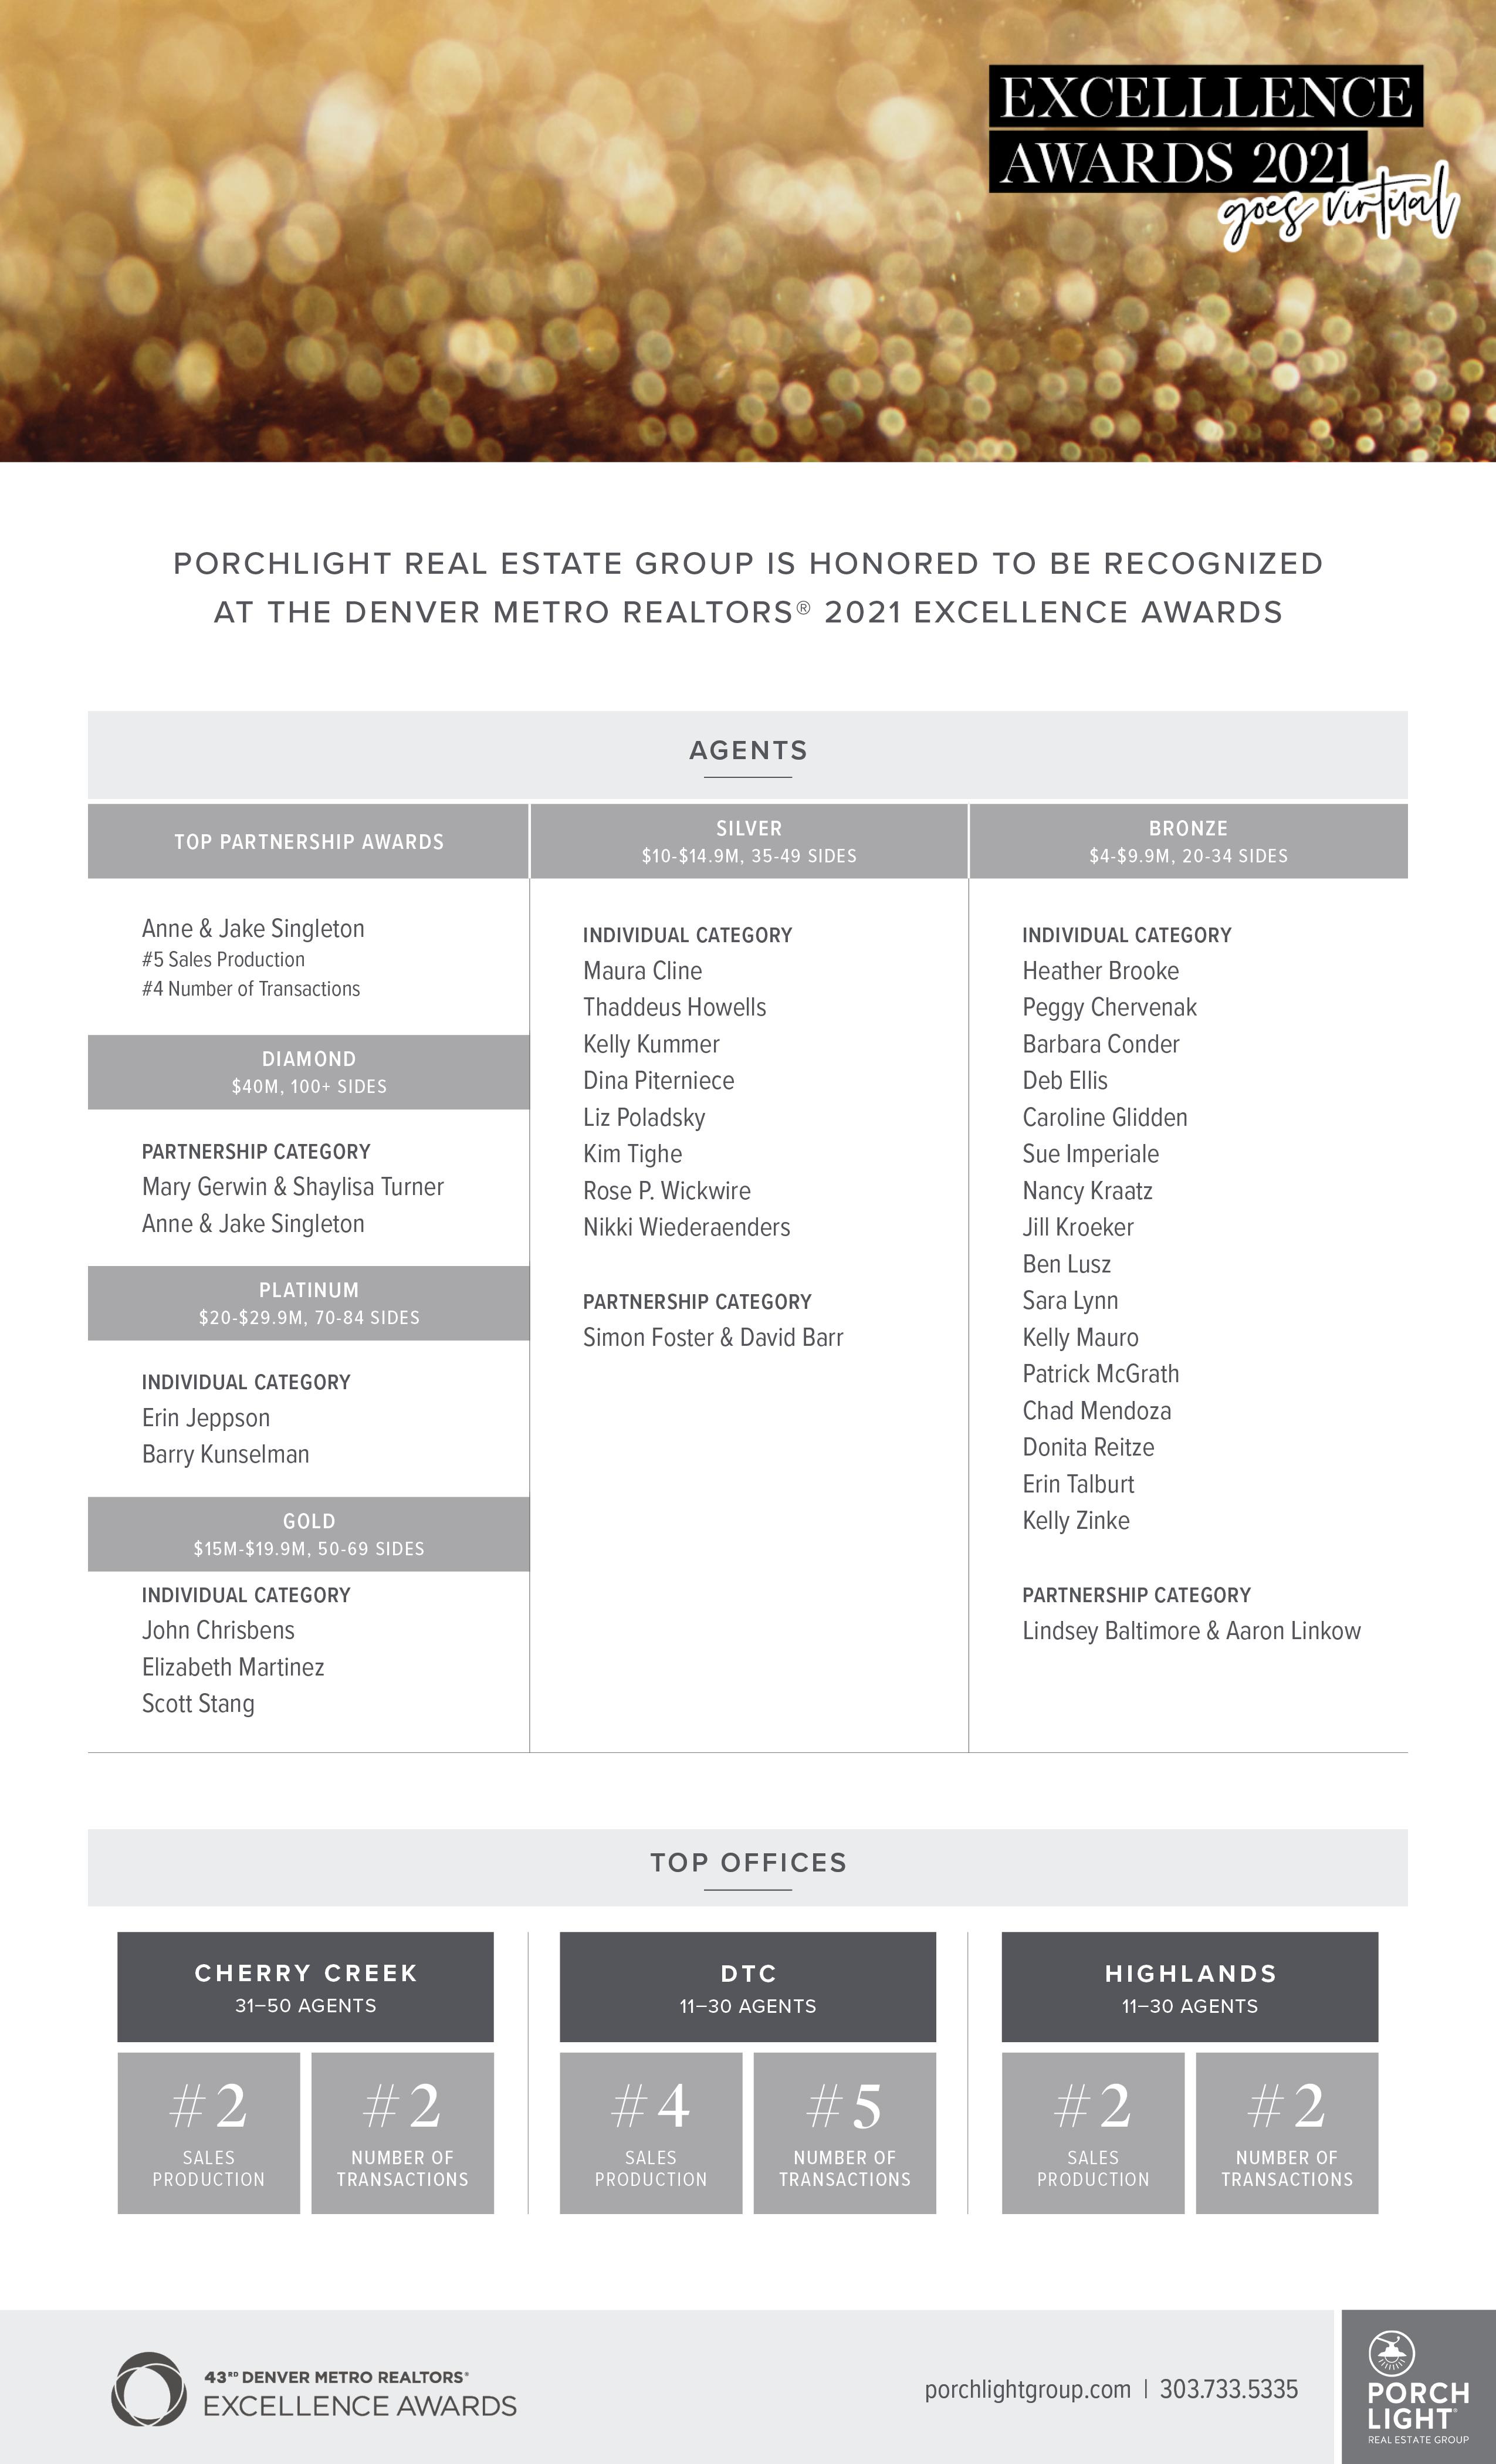 PorchLight Real Estate - DMAR Excellence Awards